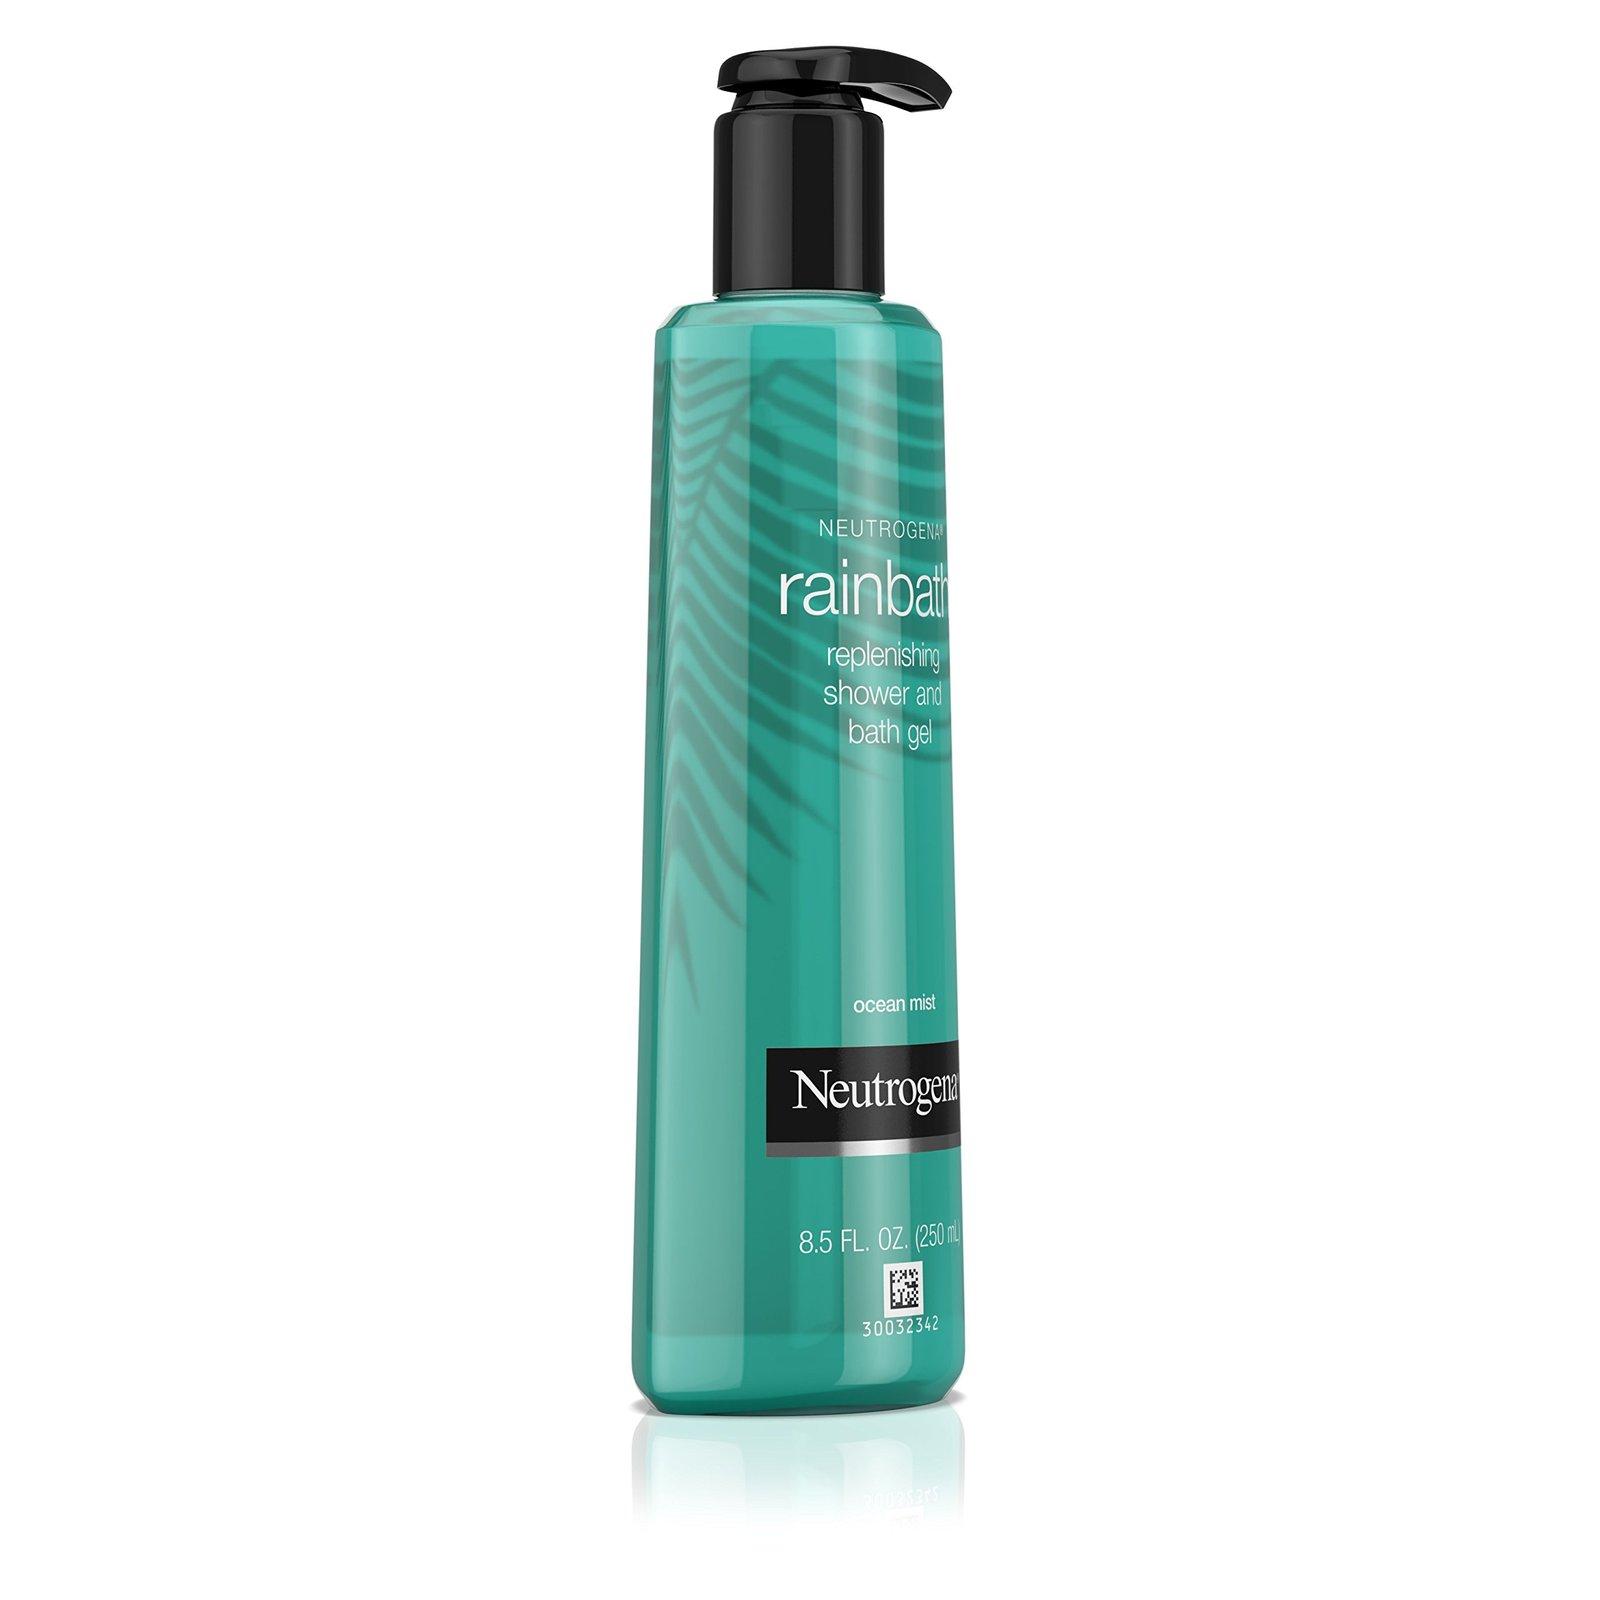 Neutrogena Rainbath Replenishing and Cleansing Shower and Bath Gel, Moisturizing